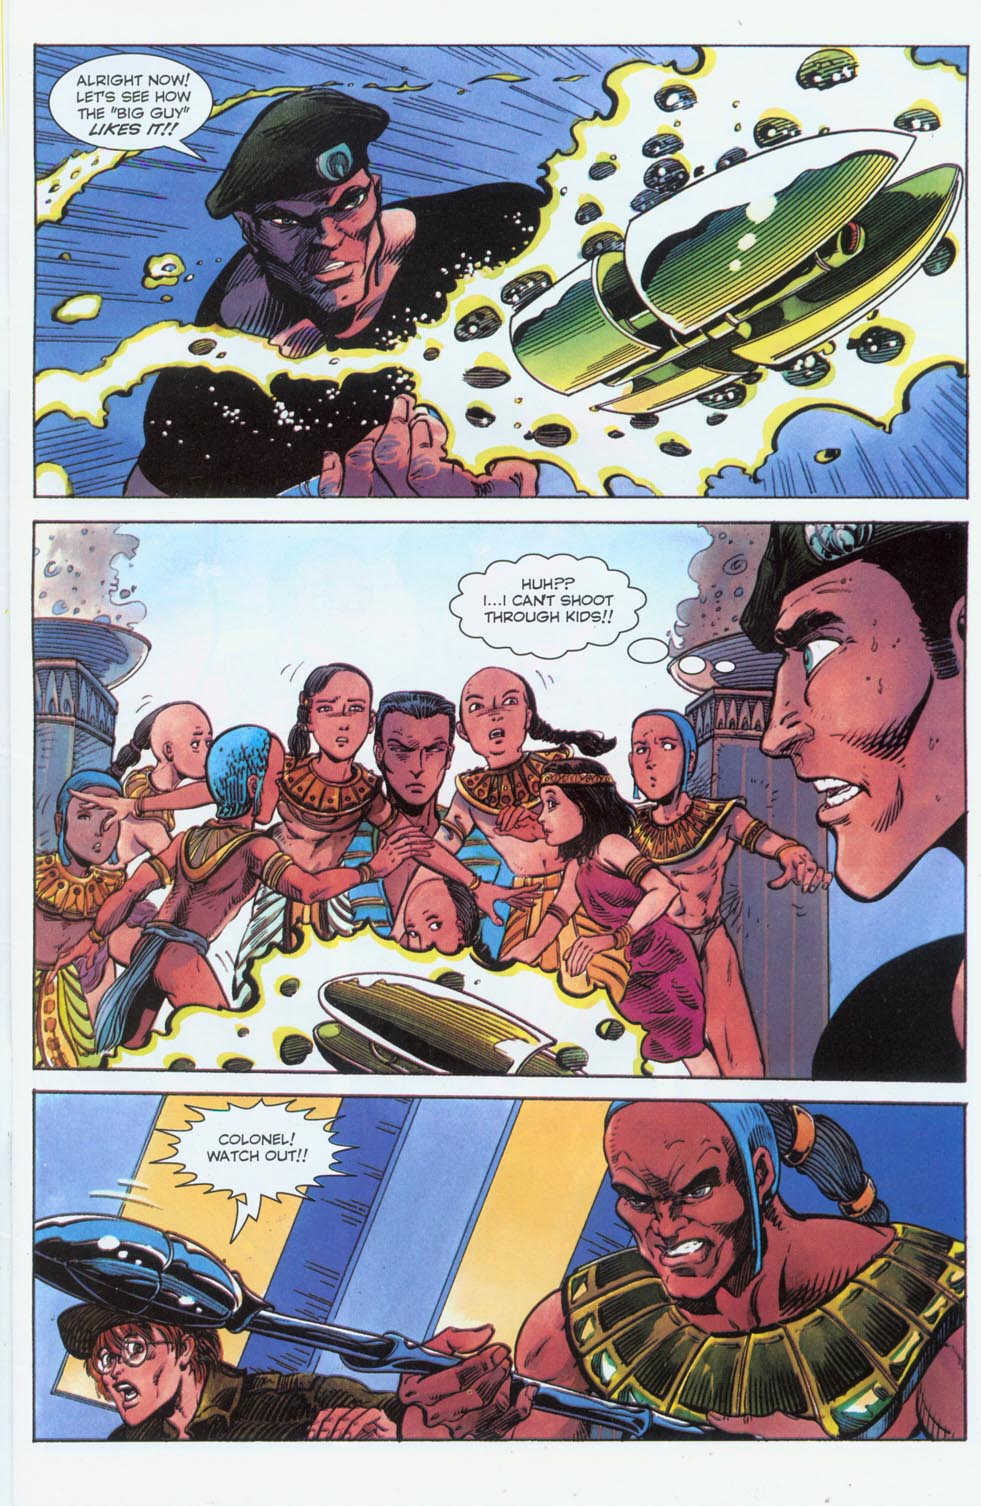 Read online Stargate comic -  Issue #3 - 5